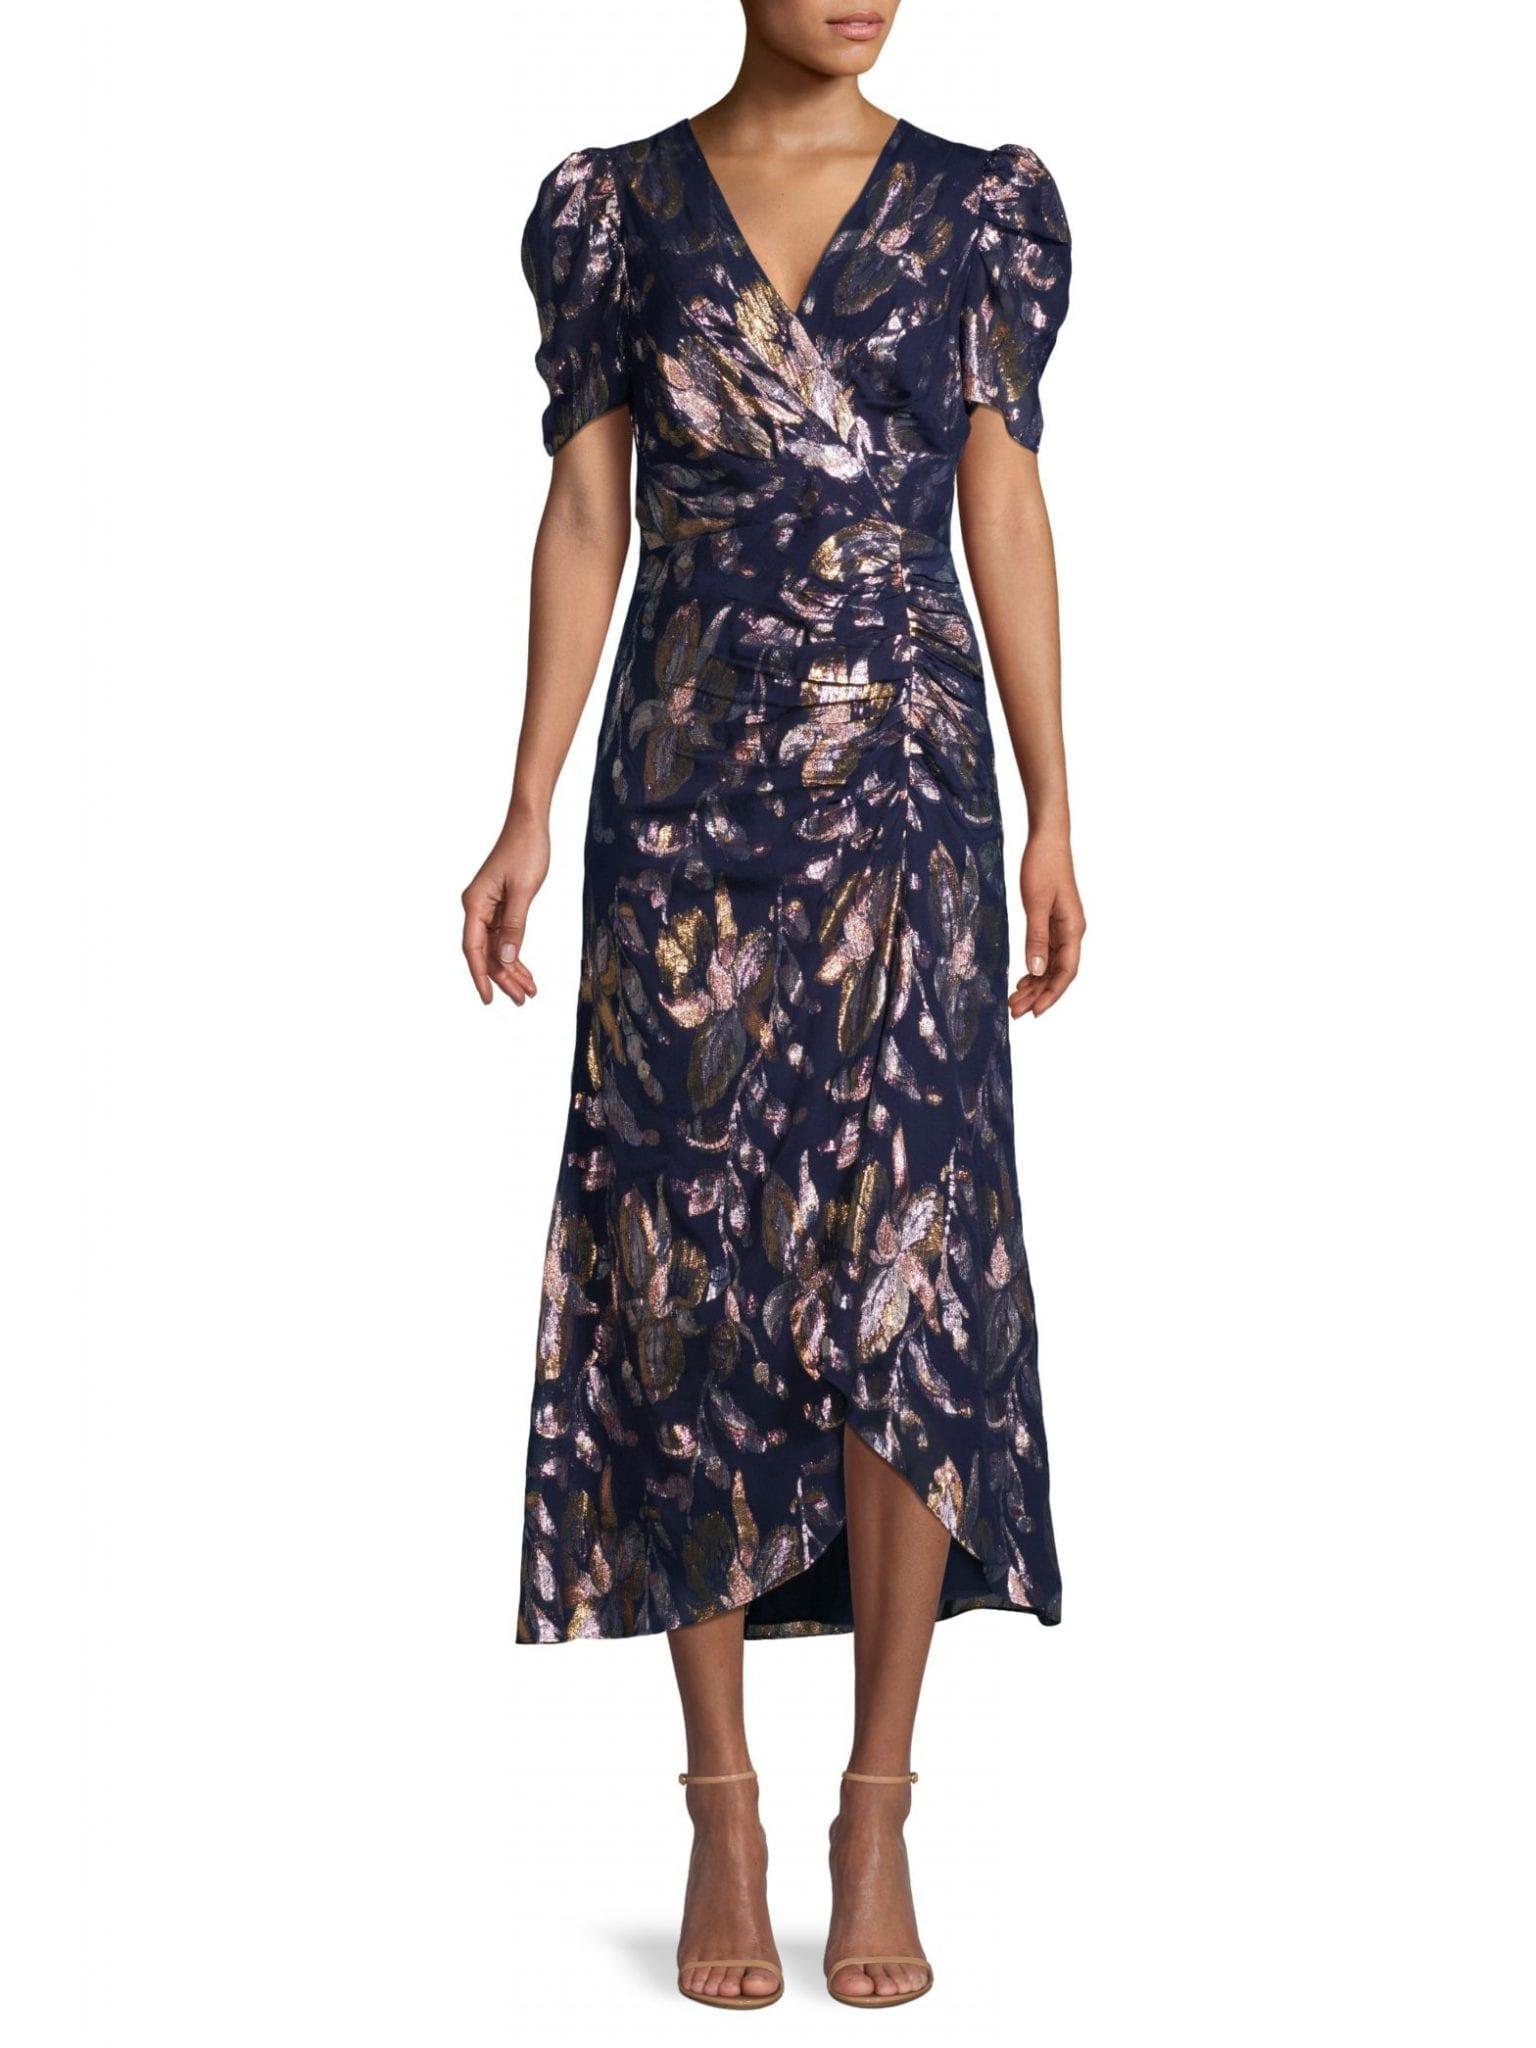 SHOSHANNA Chloe Metallic Floral Dress